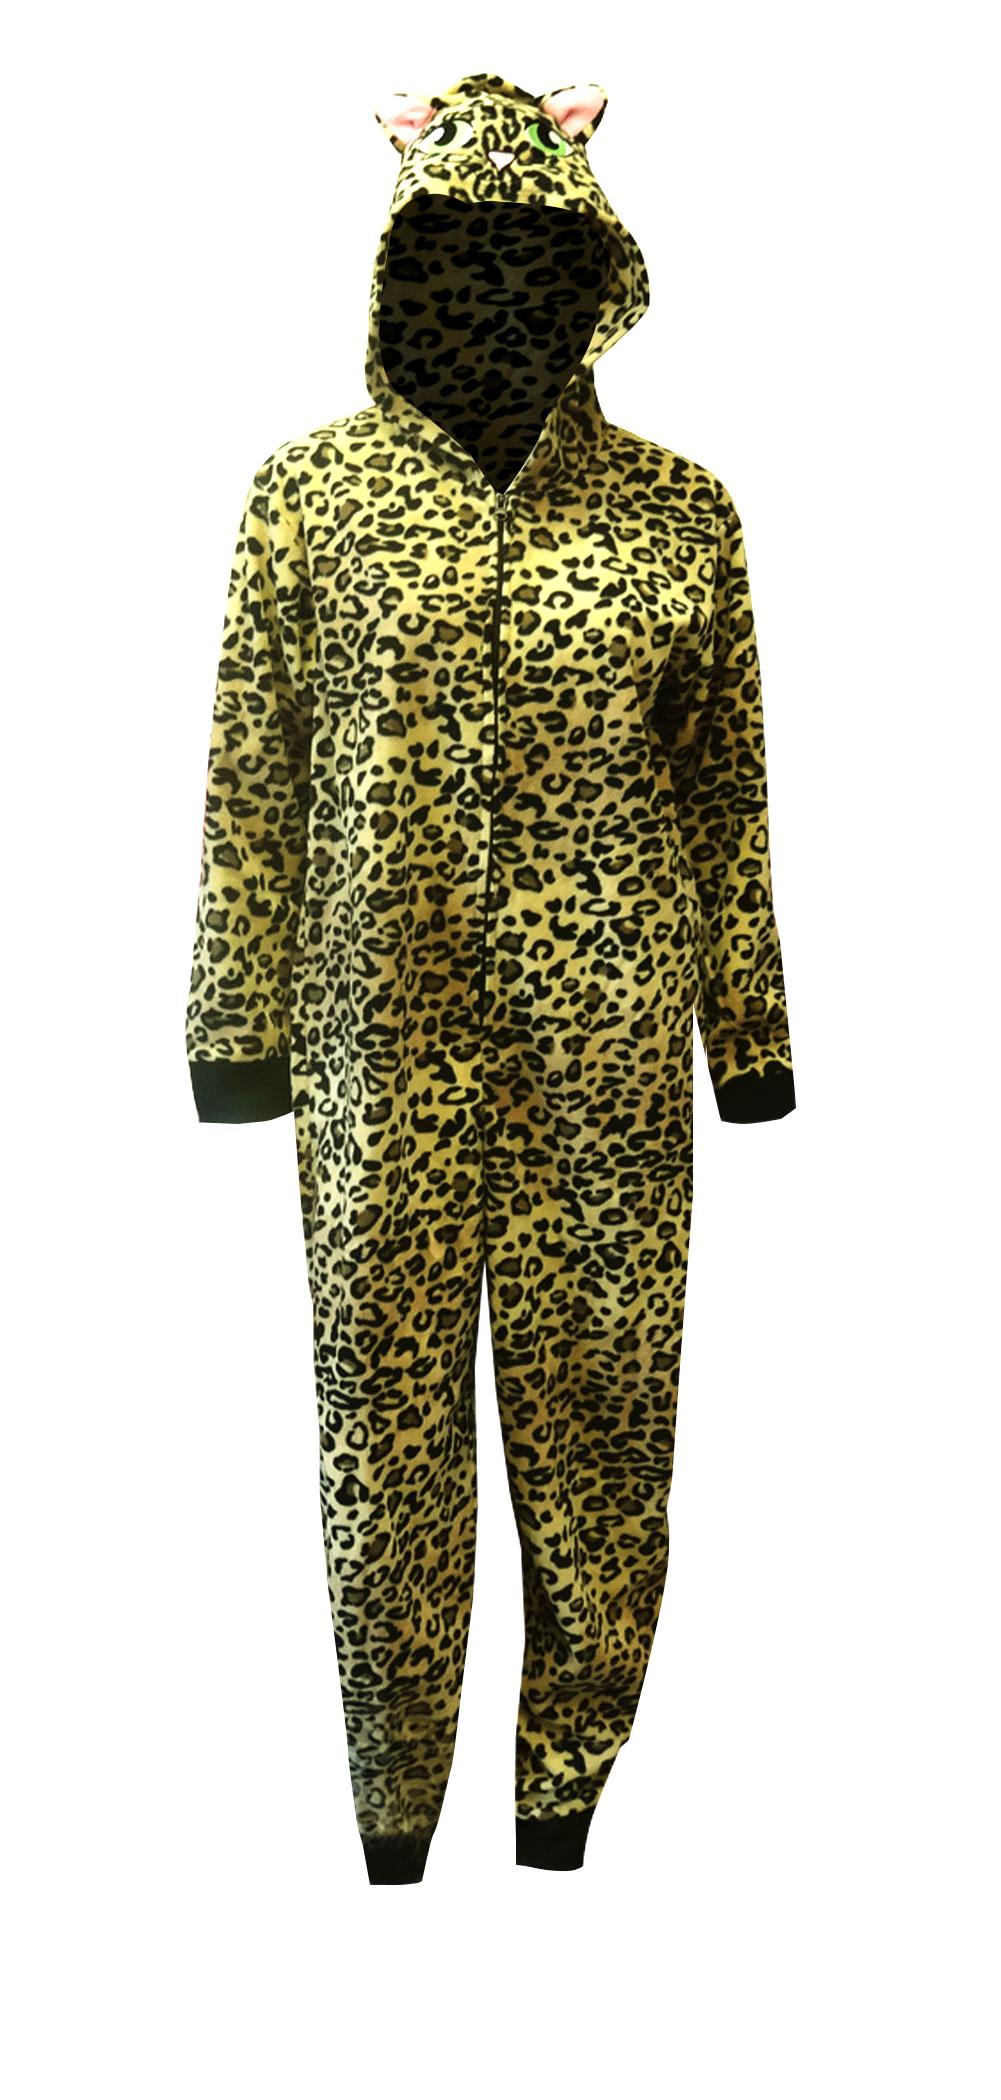 WebUndies.com Leopard Print Beige Hooded One Piece Footed ...